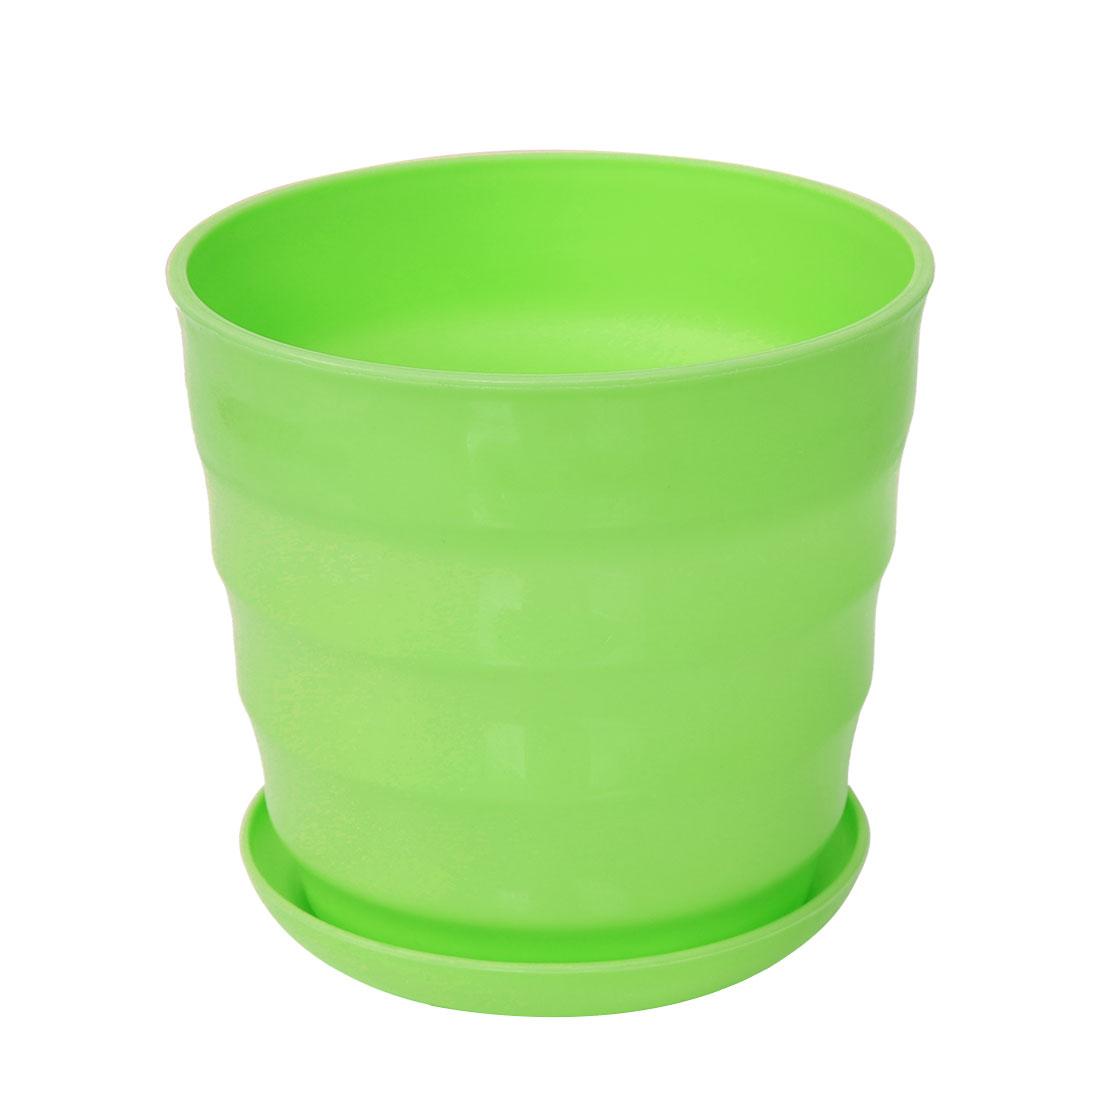 Home Garden Patio Plastic Stripe Pattern Plant Planter Holder Flower Pot Green